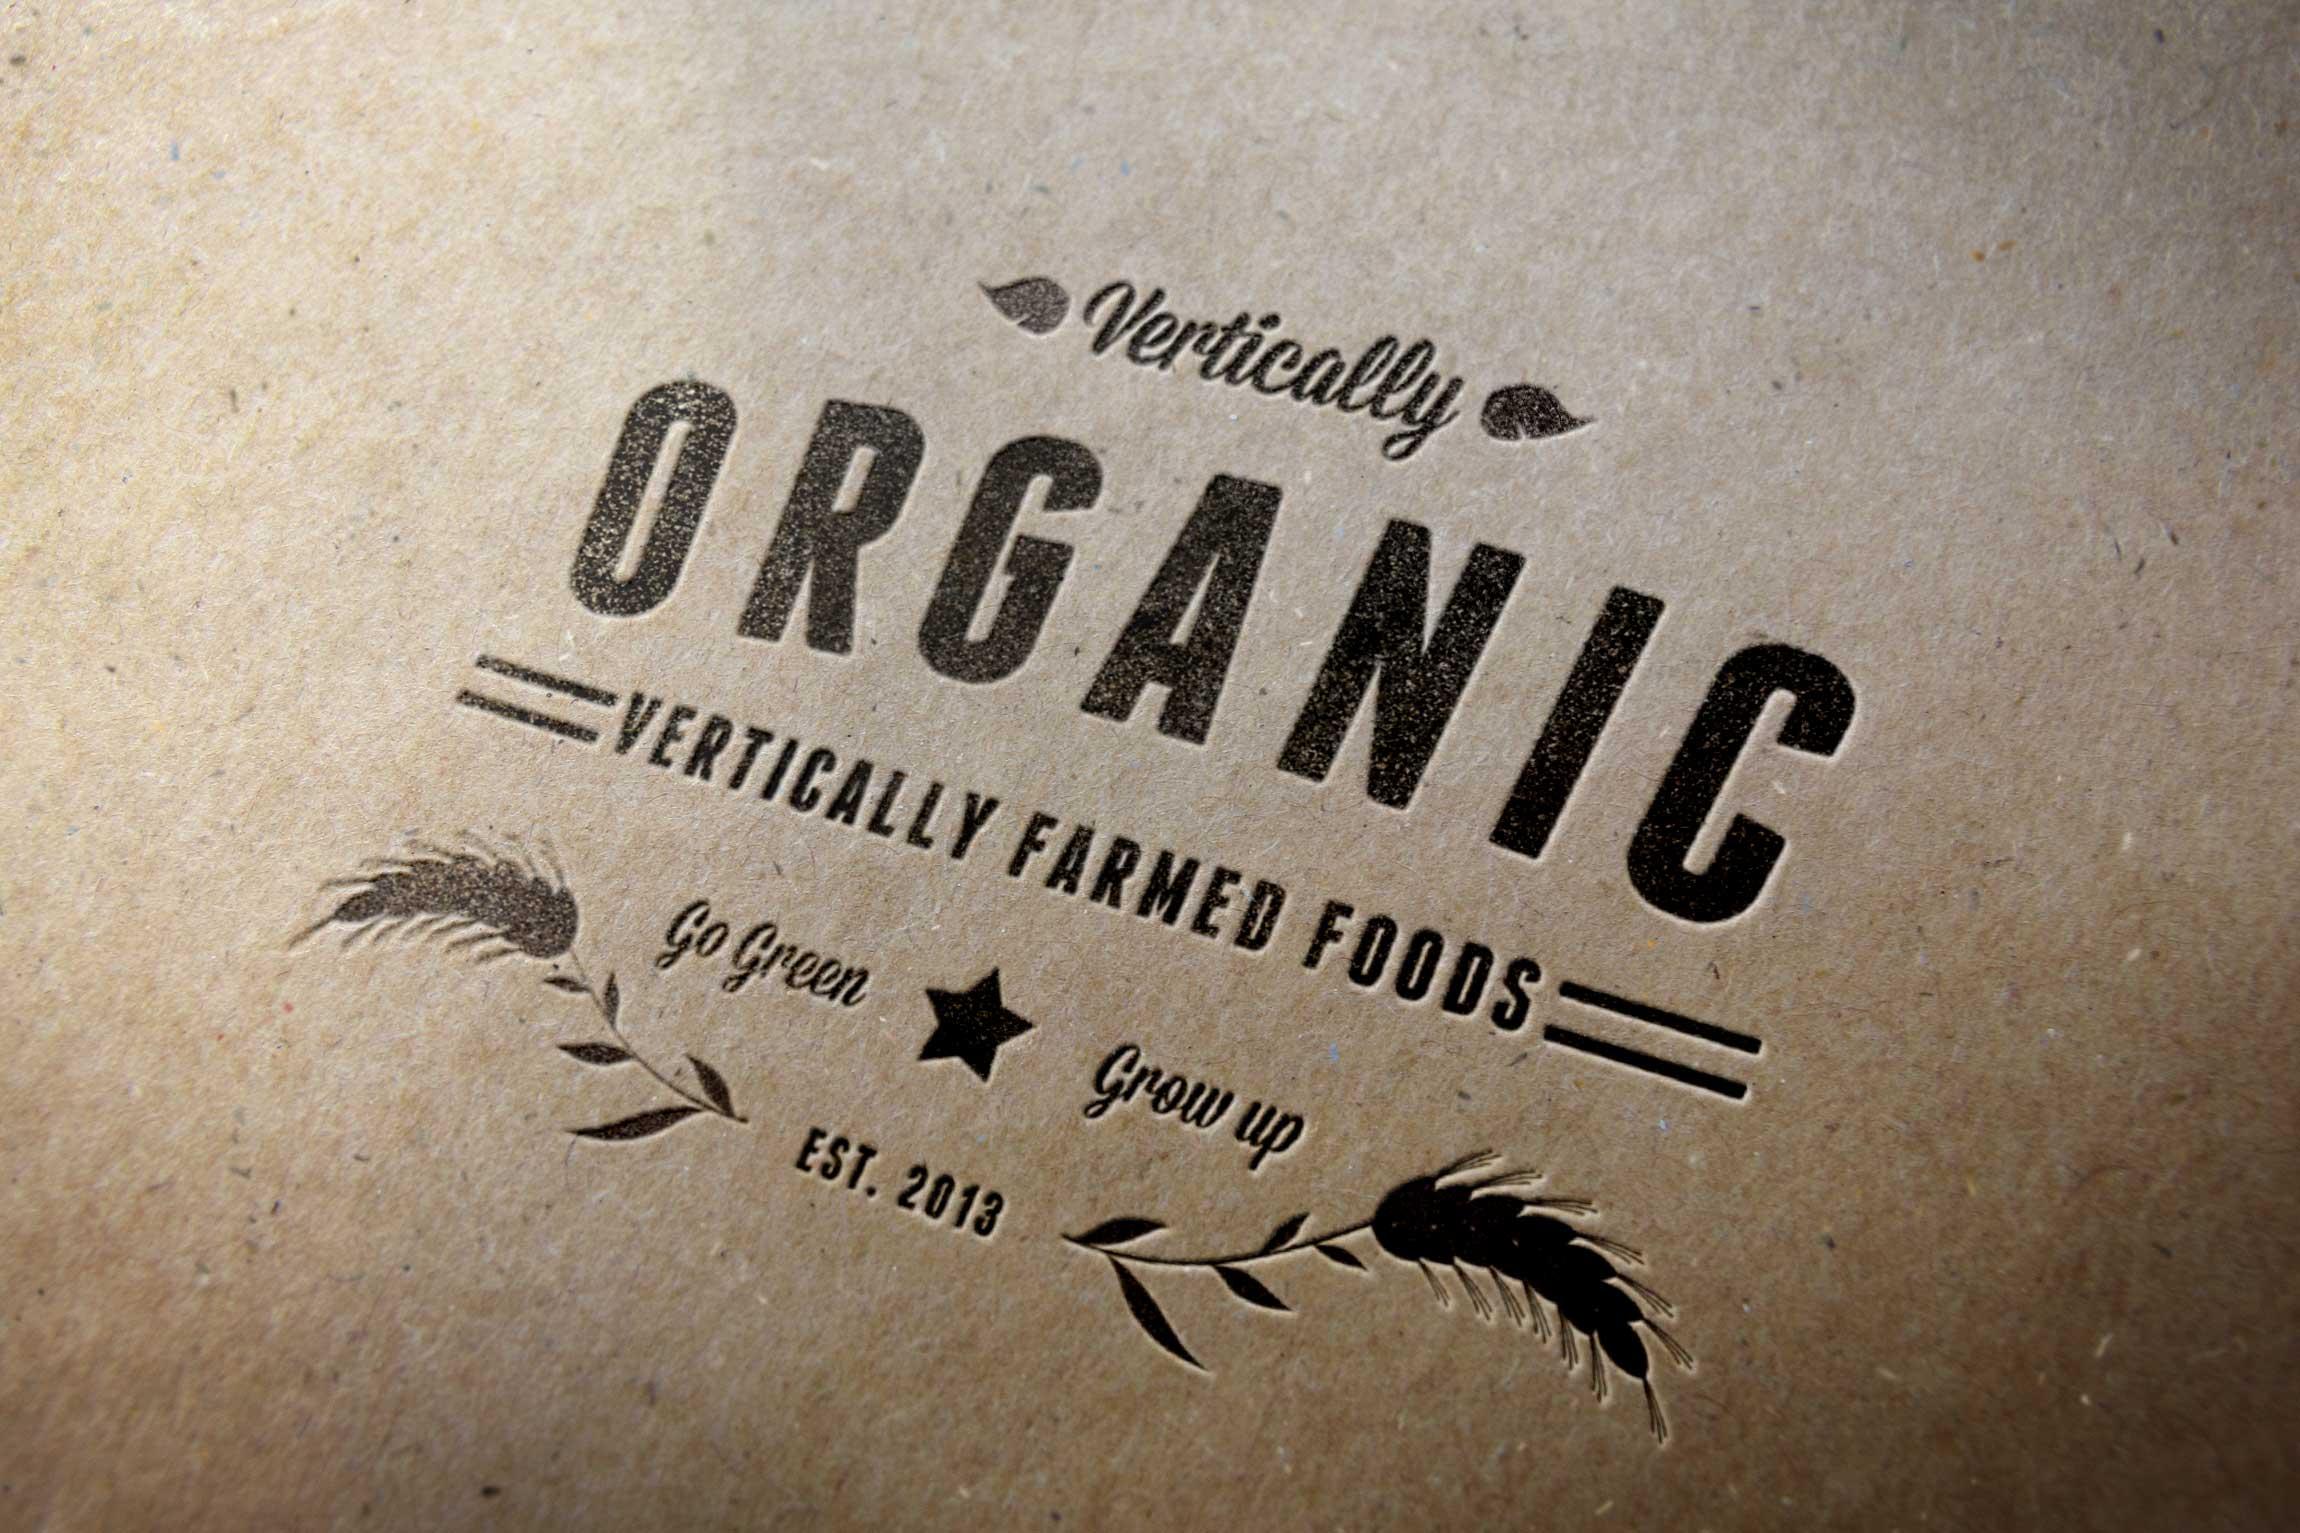 Vertical-Farm-Logo-MockUp-#2.jpg